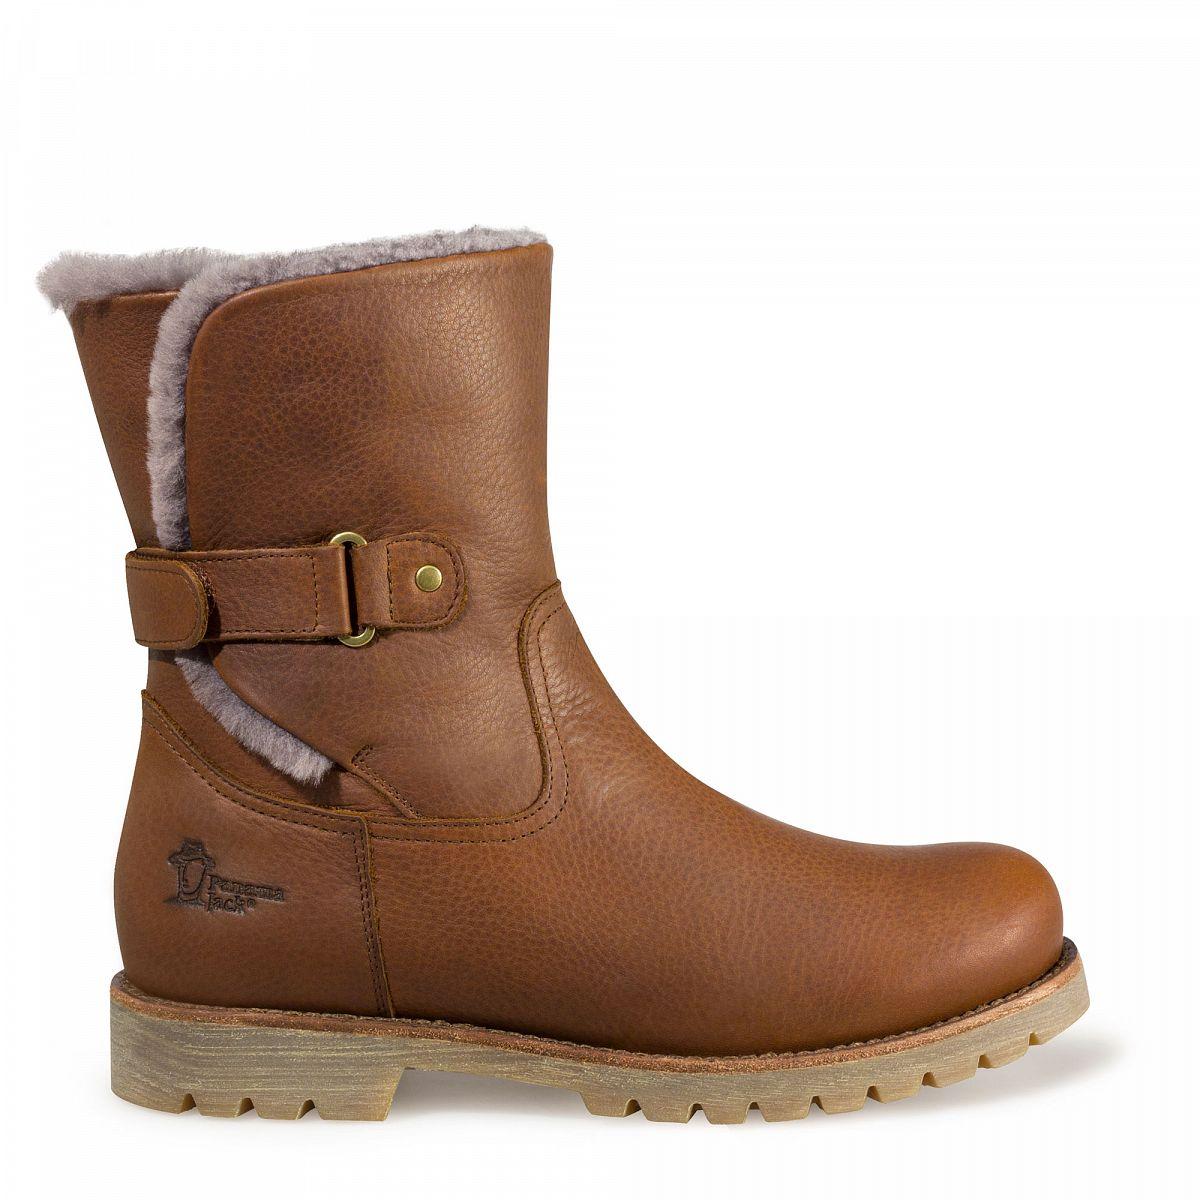 women 39 s boots felia igloo bark panama jack official store. Black Bedroom Furniture Sets. Home Design Ideas